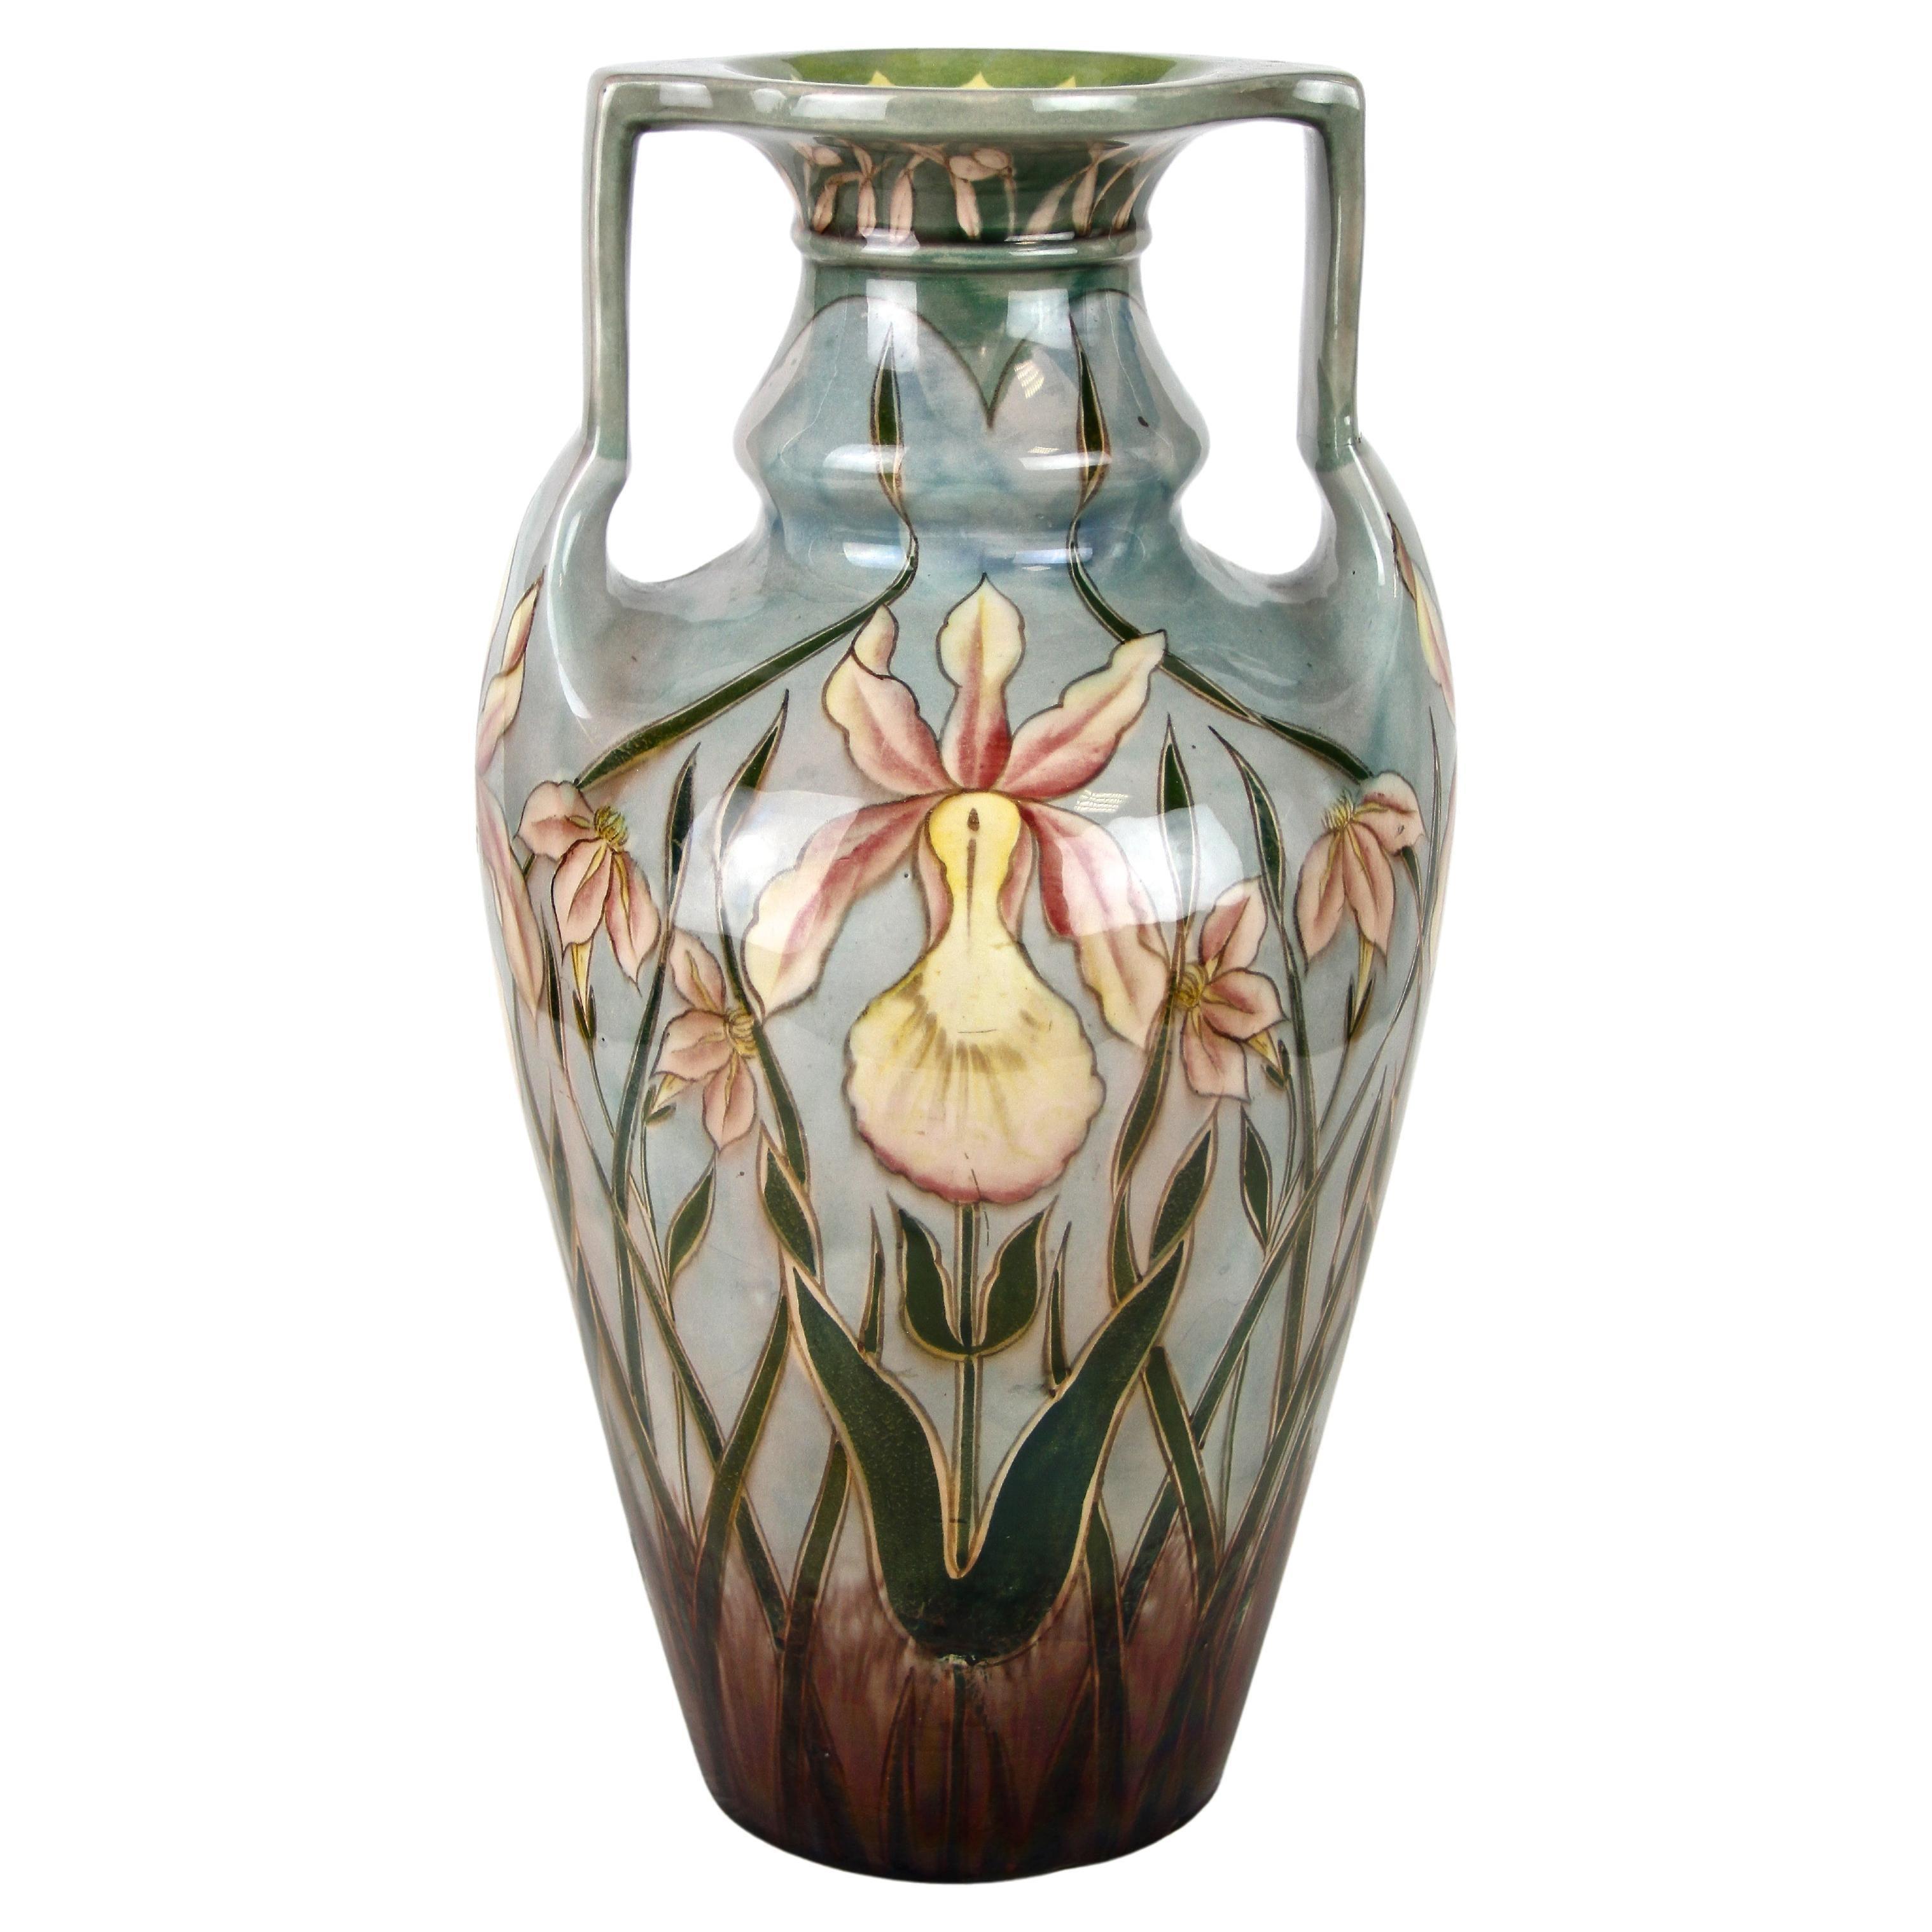 Art Nouveau Majolica Vase by Gerbing & Stephan, Bohemia circa 1910